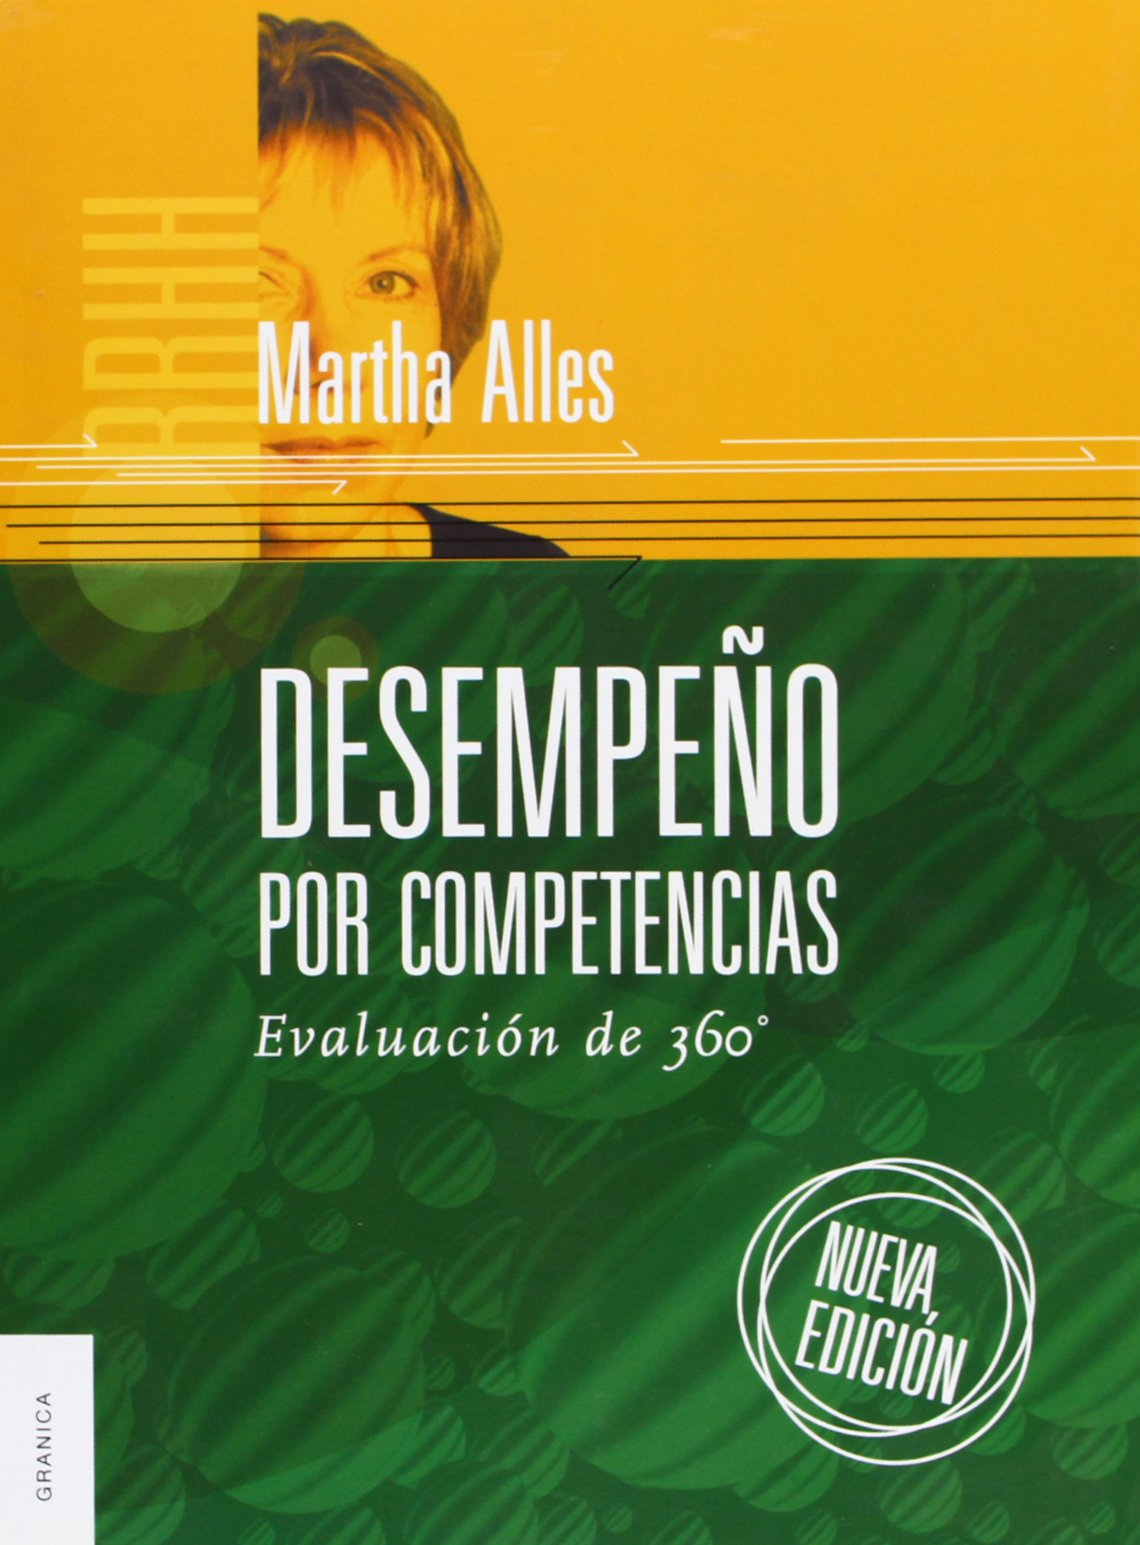 Desempeño Por Competencias Alles Martha Alicia 9789506415402 Books